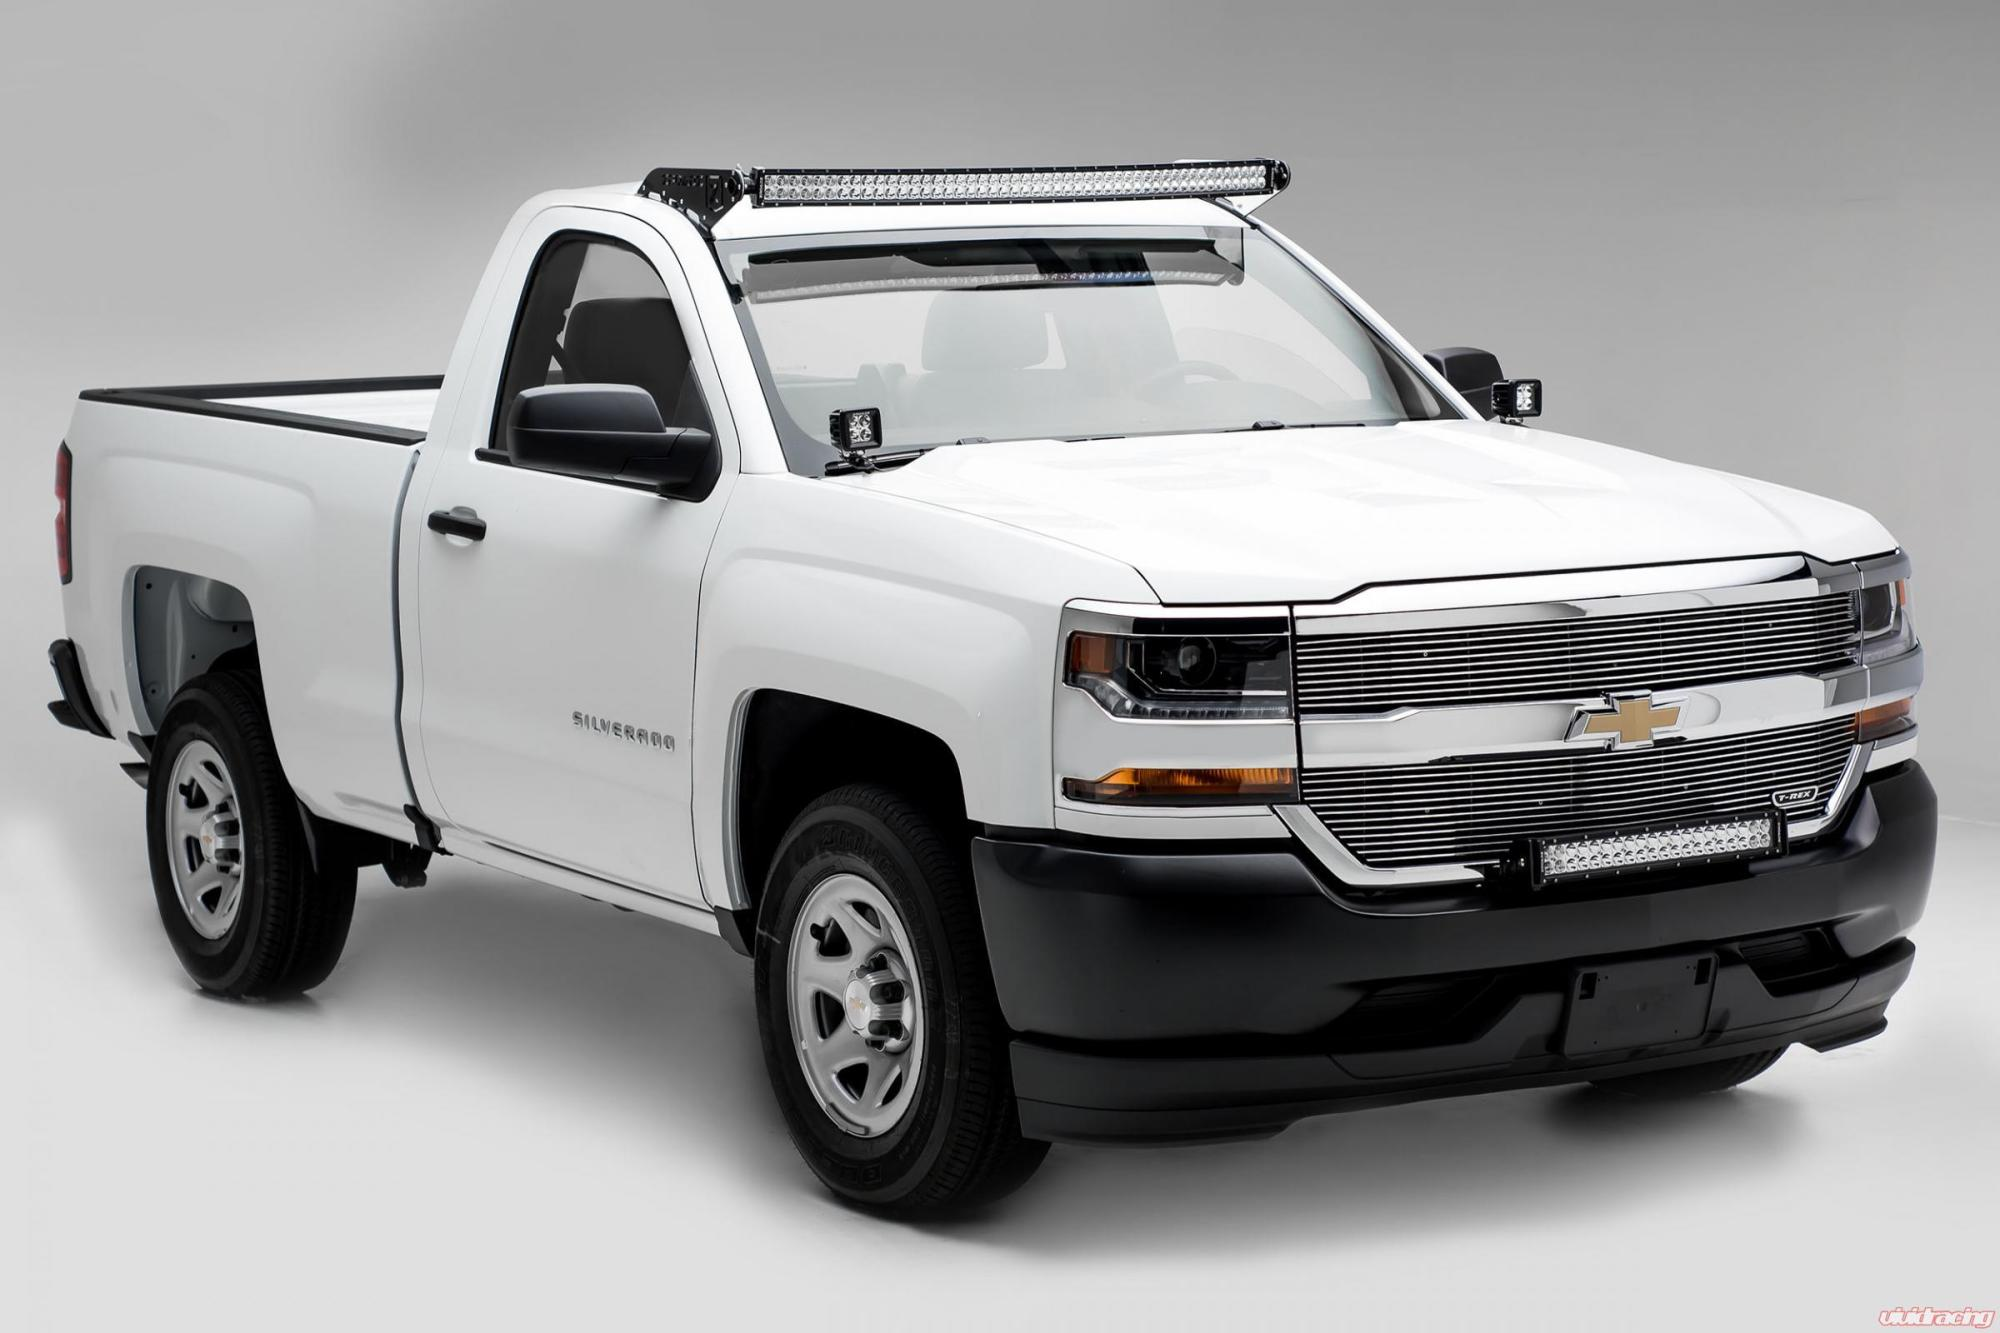 hight resolution of front bumper top led light bar mount kit w 30 inch led light bar includes